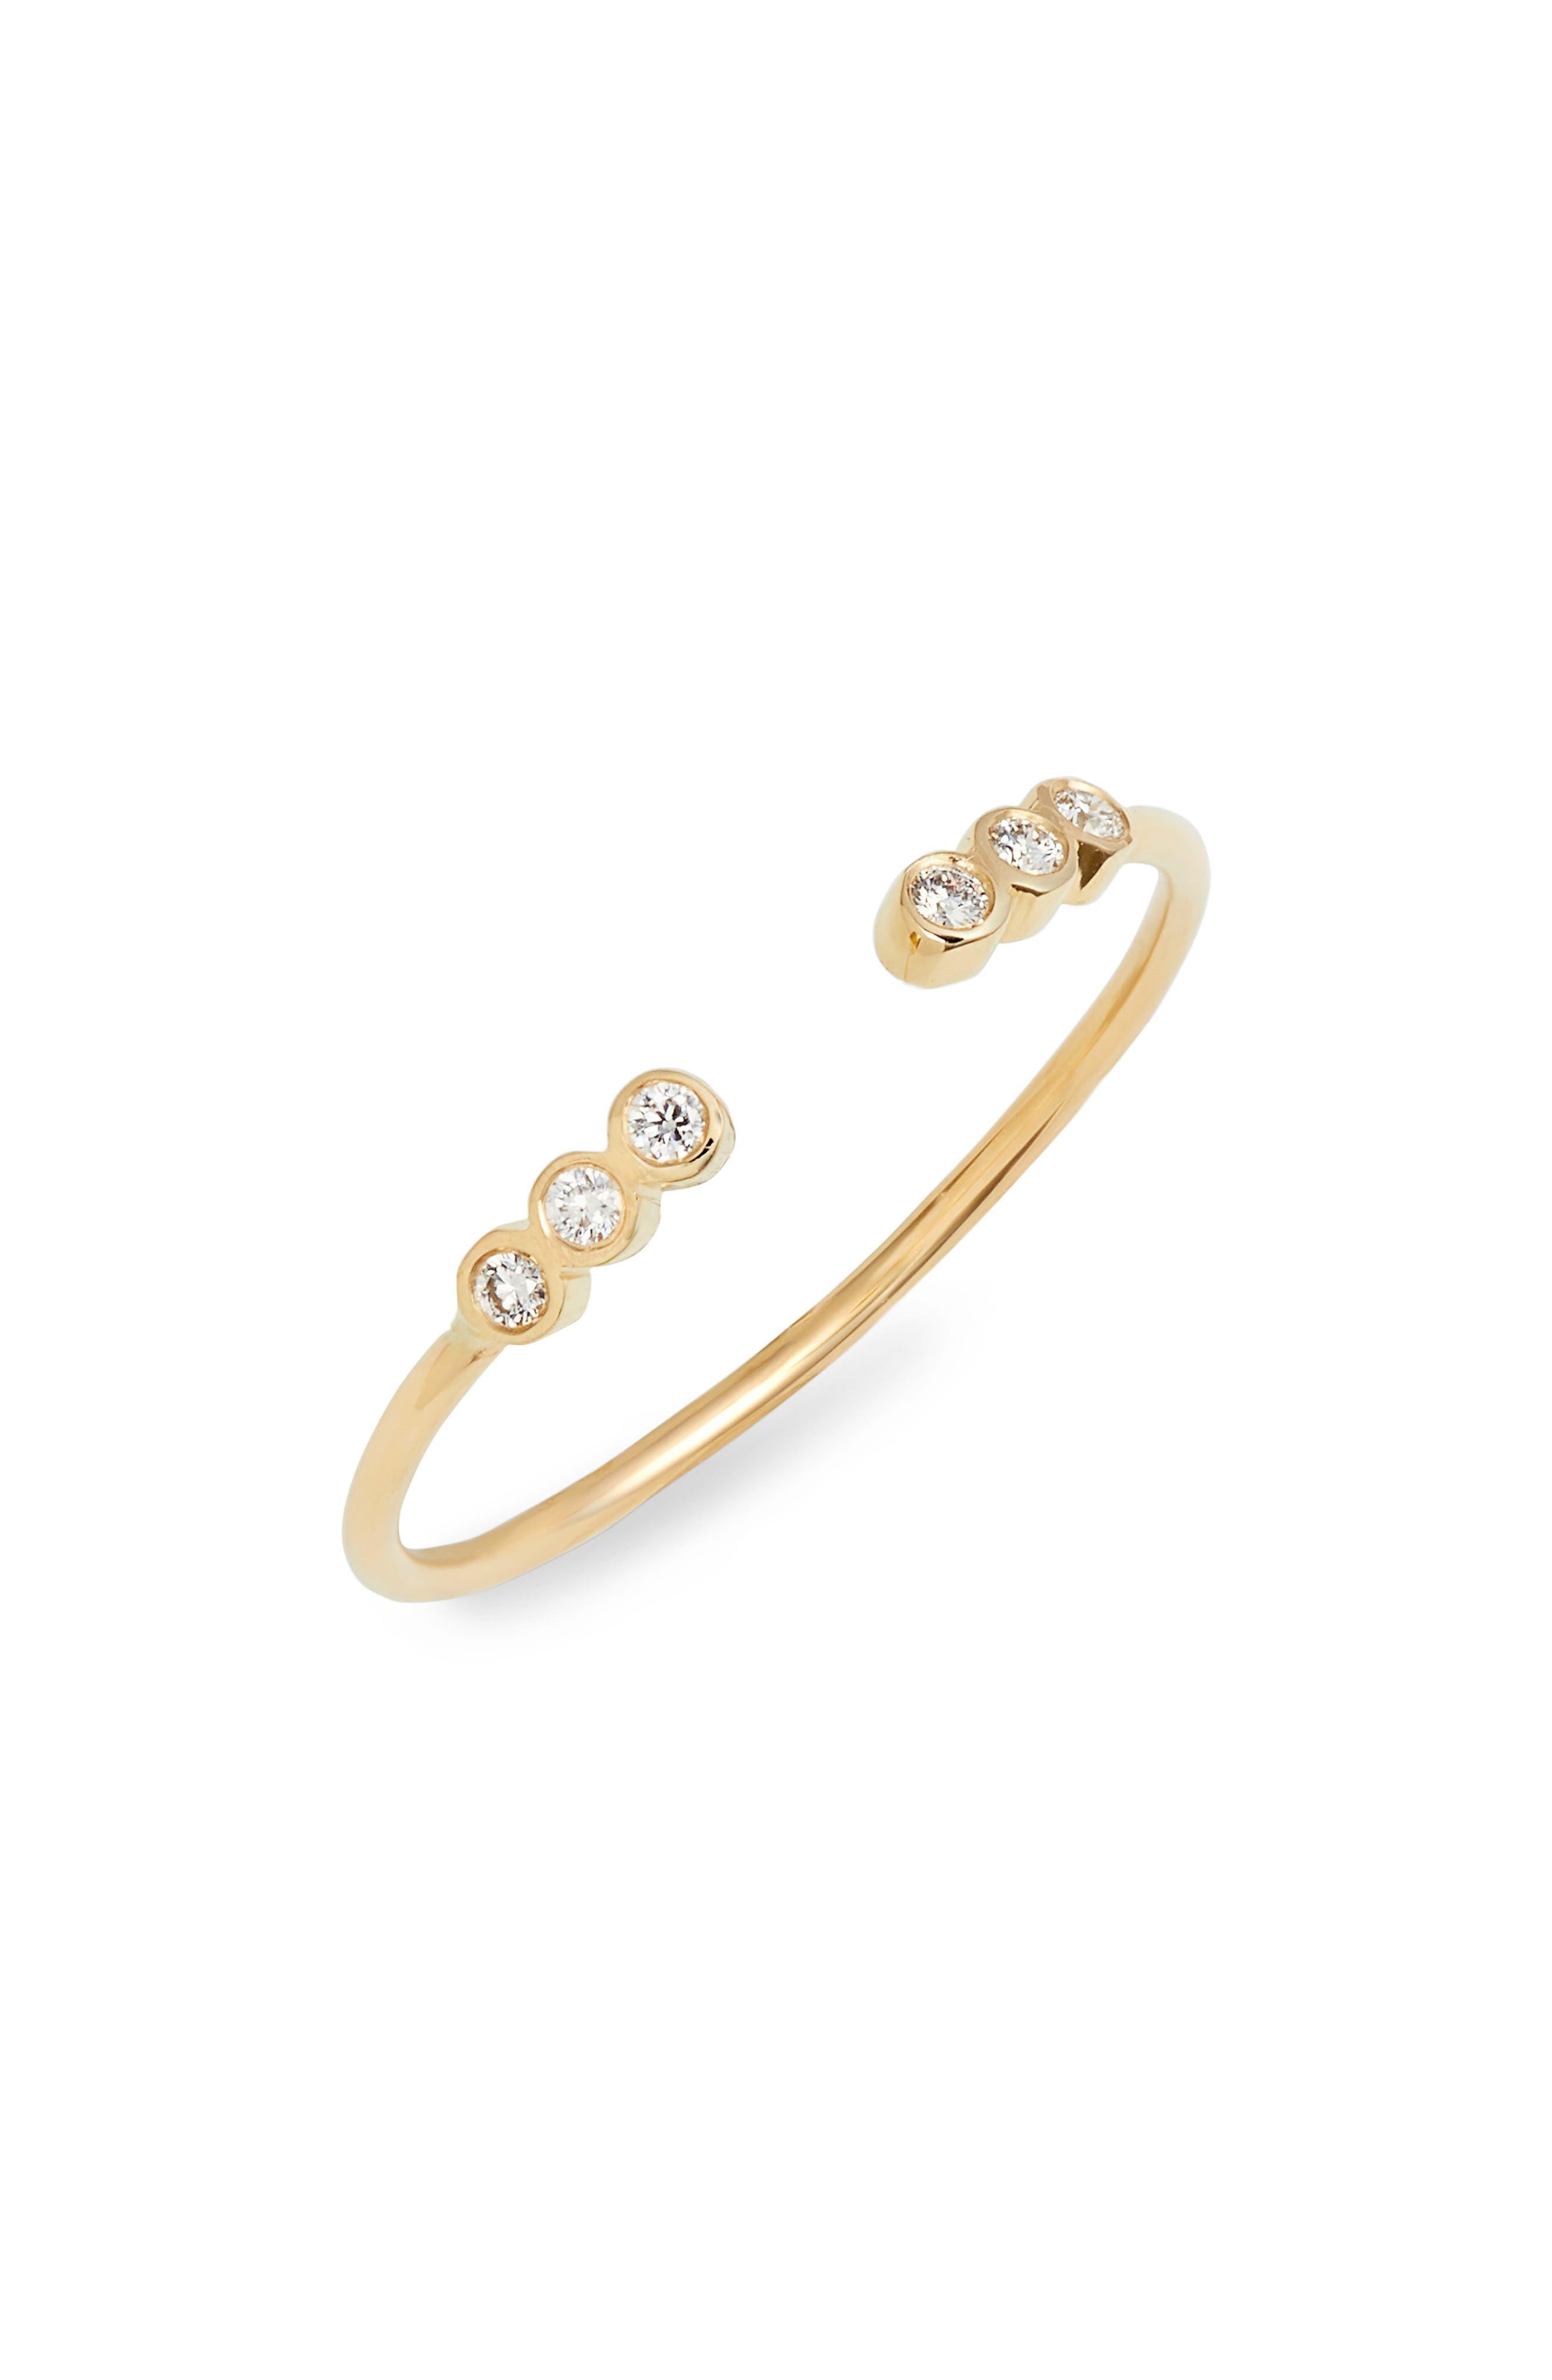 Six Diamond Bezel Open Stackable Ring,                             Main thumbnail 1, color,                             YELLOW GOLD